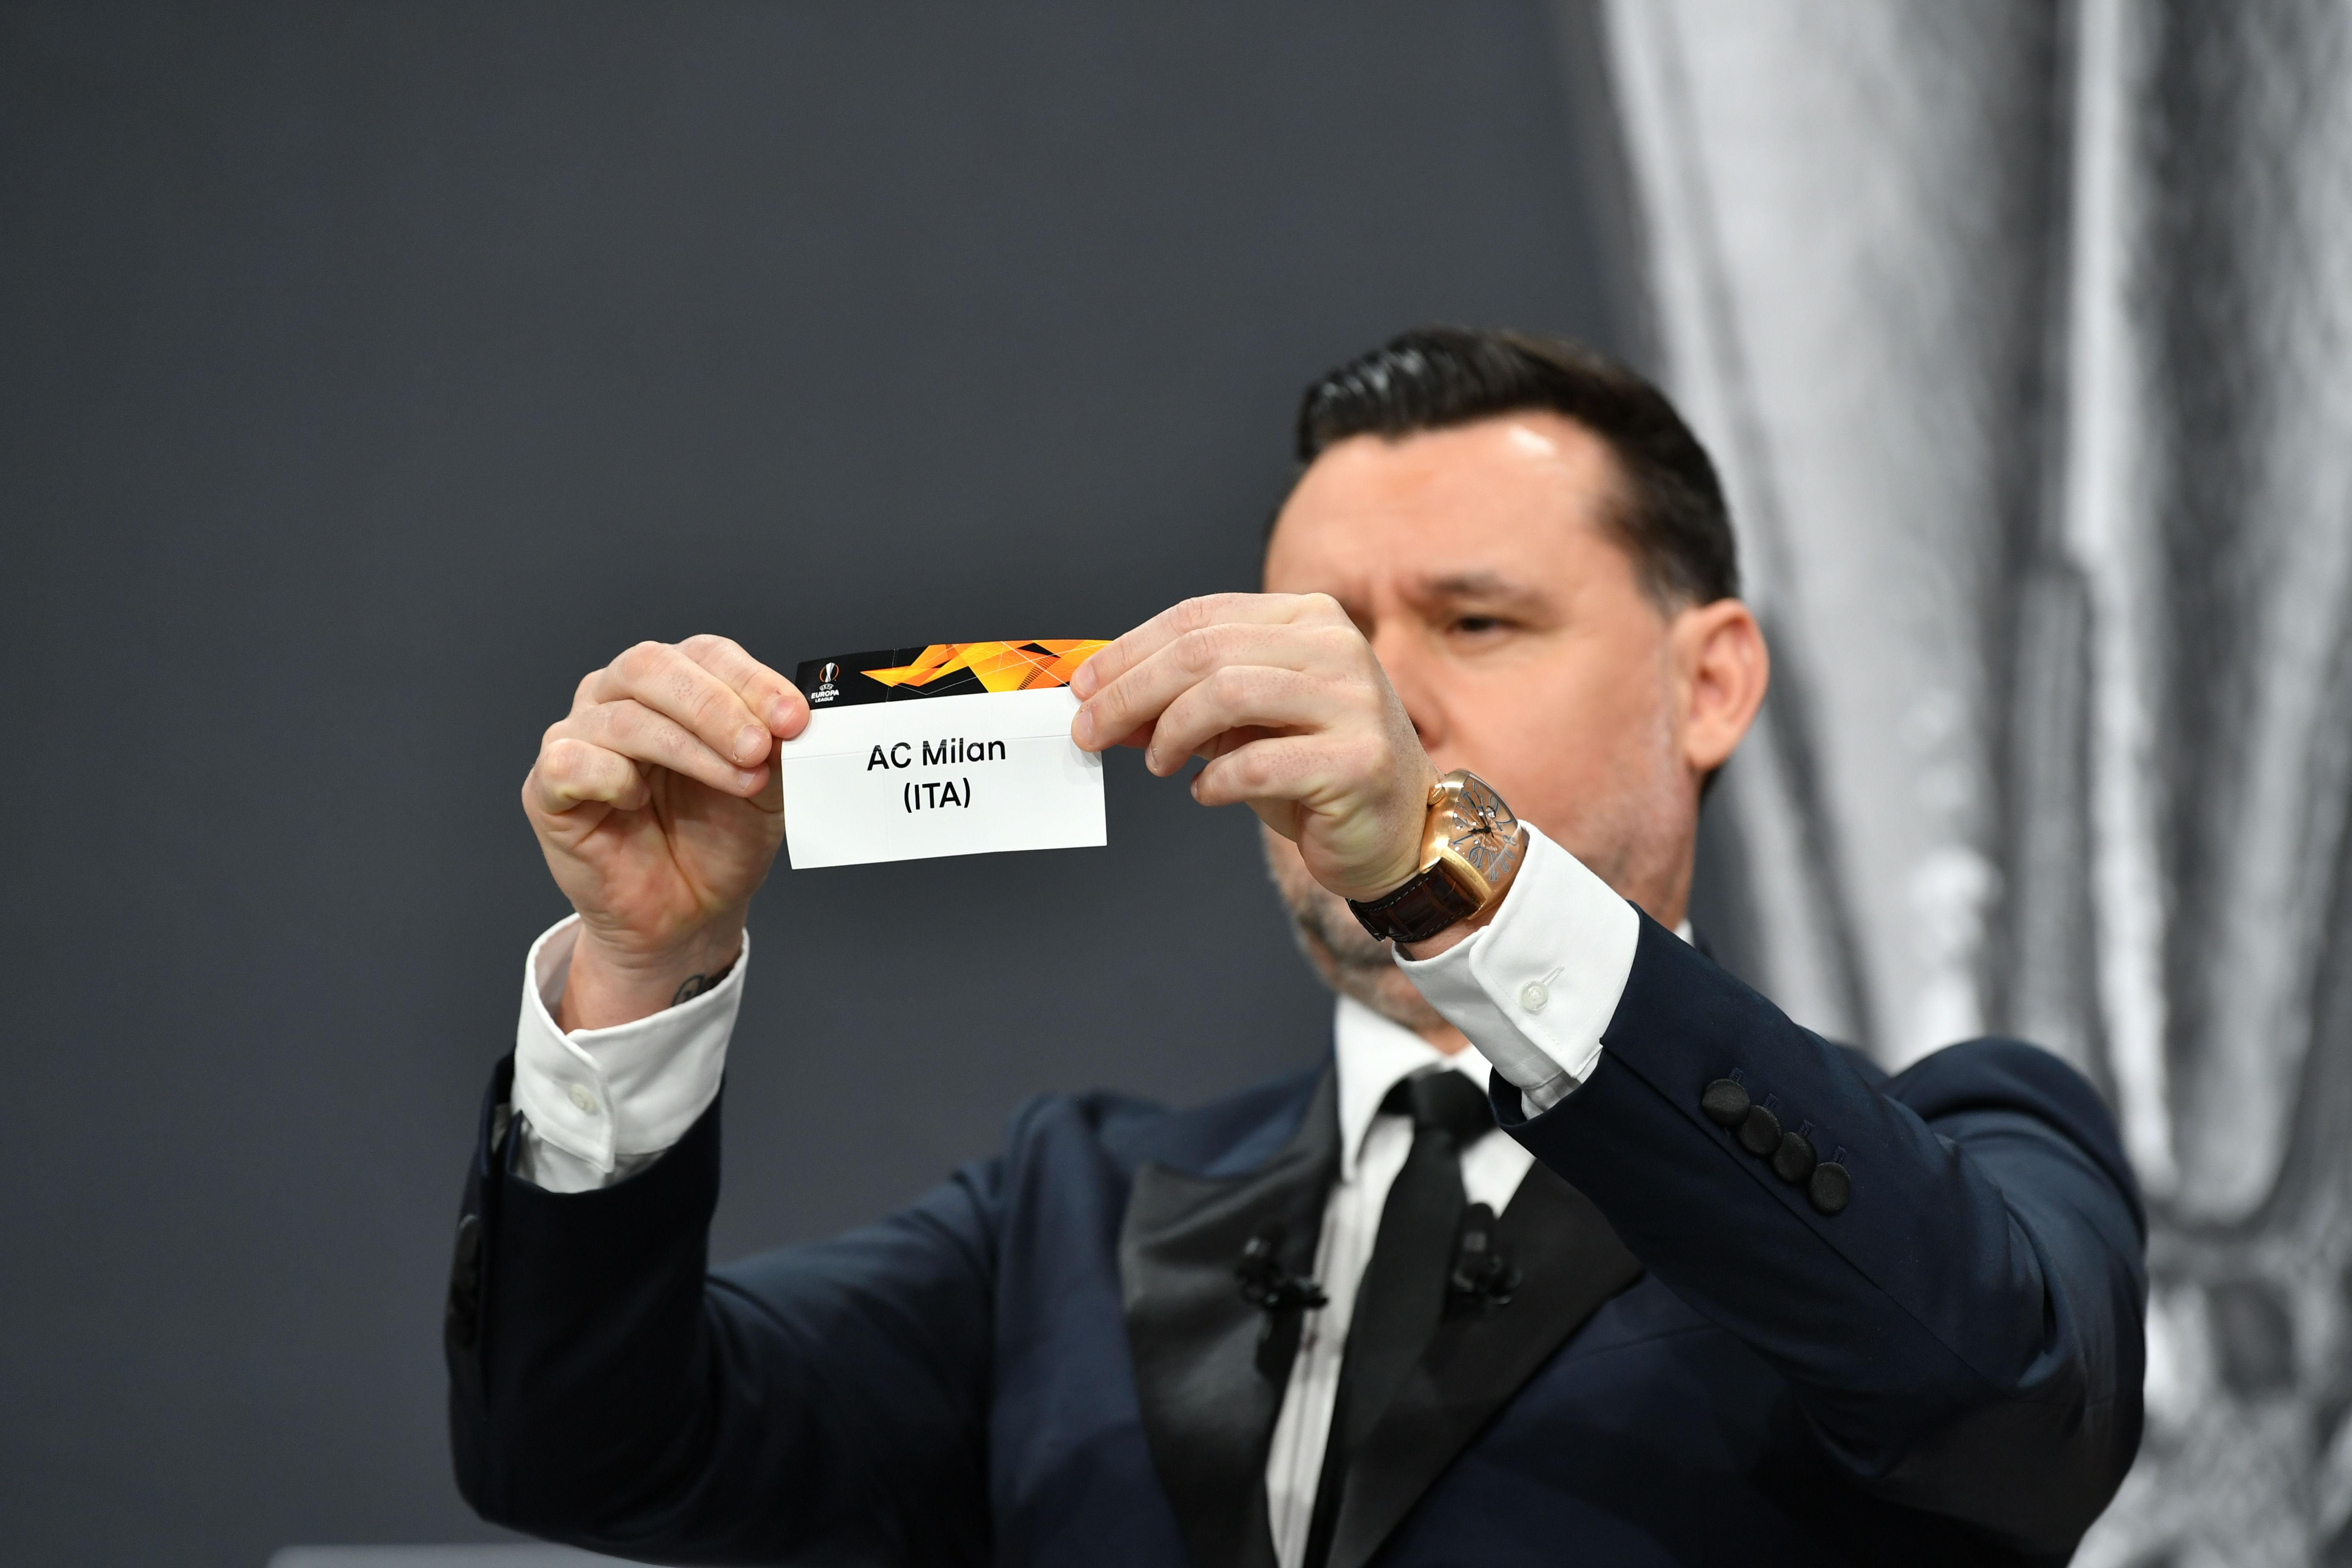 UEFA Europa League 2020/21 Round of 32 Draw